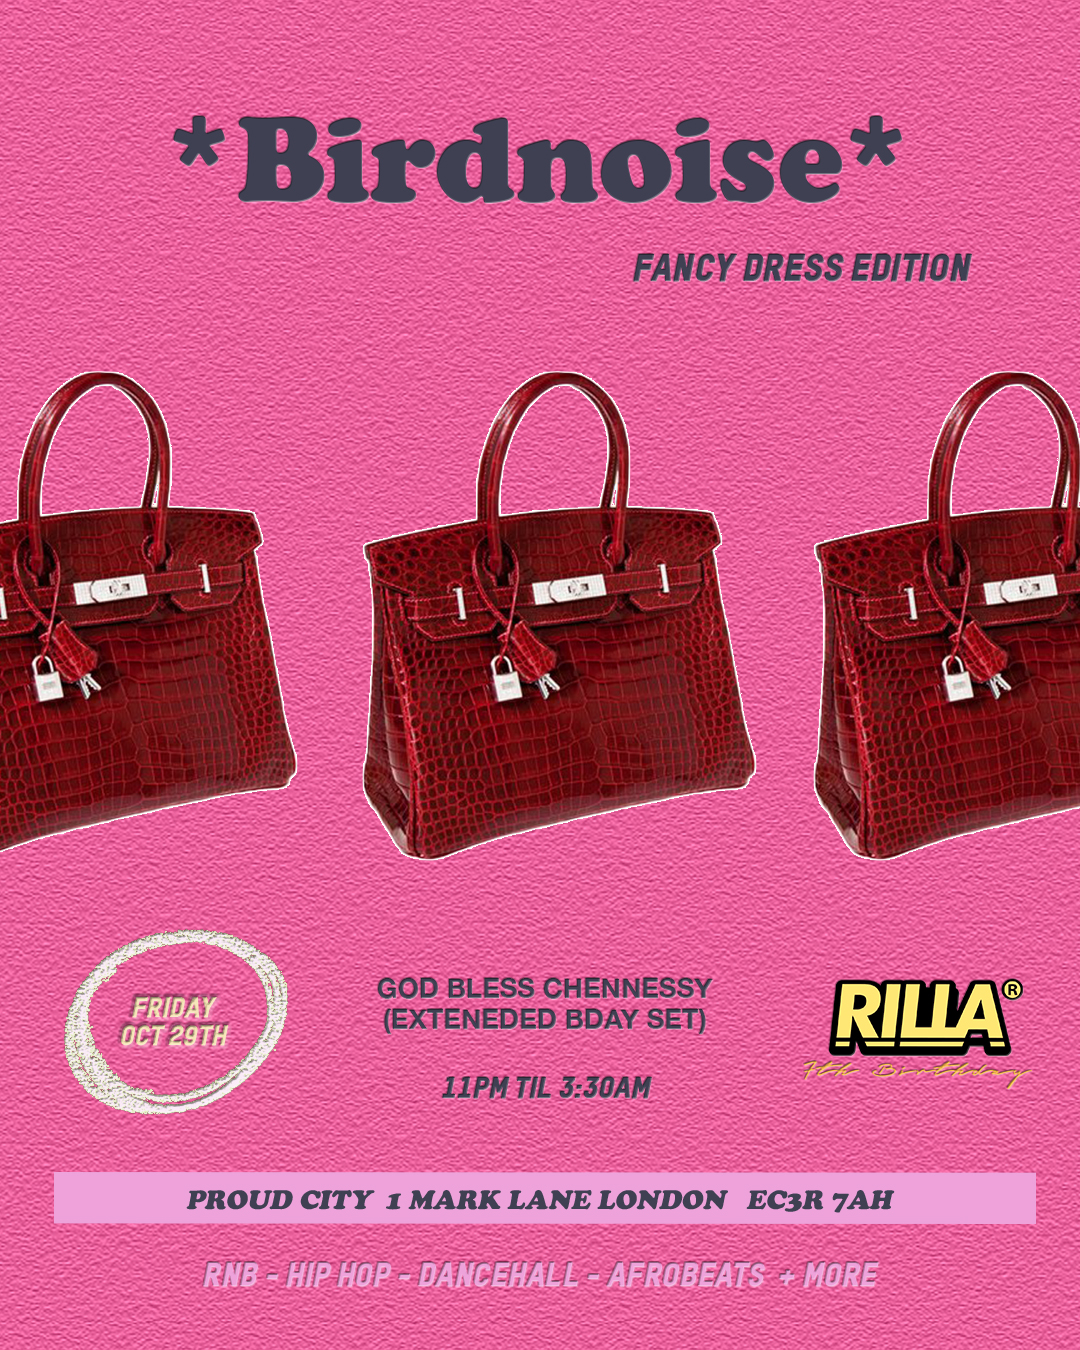 RILLA 7th Birthday x *Birdnoise* Fancy Dress Special (2 Rooms)